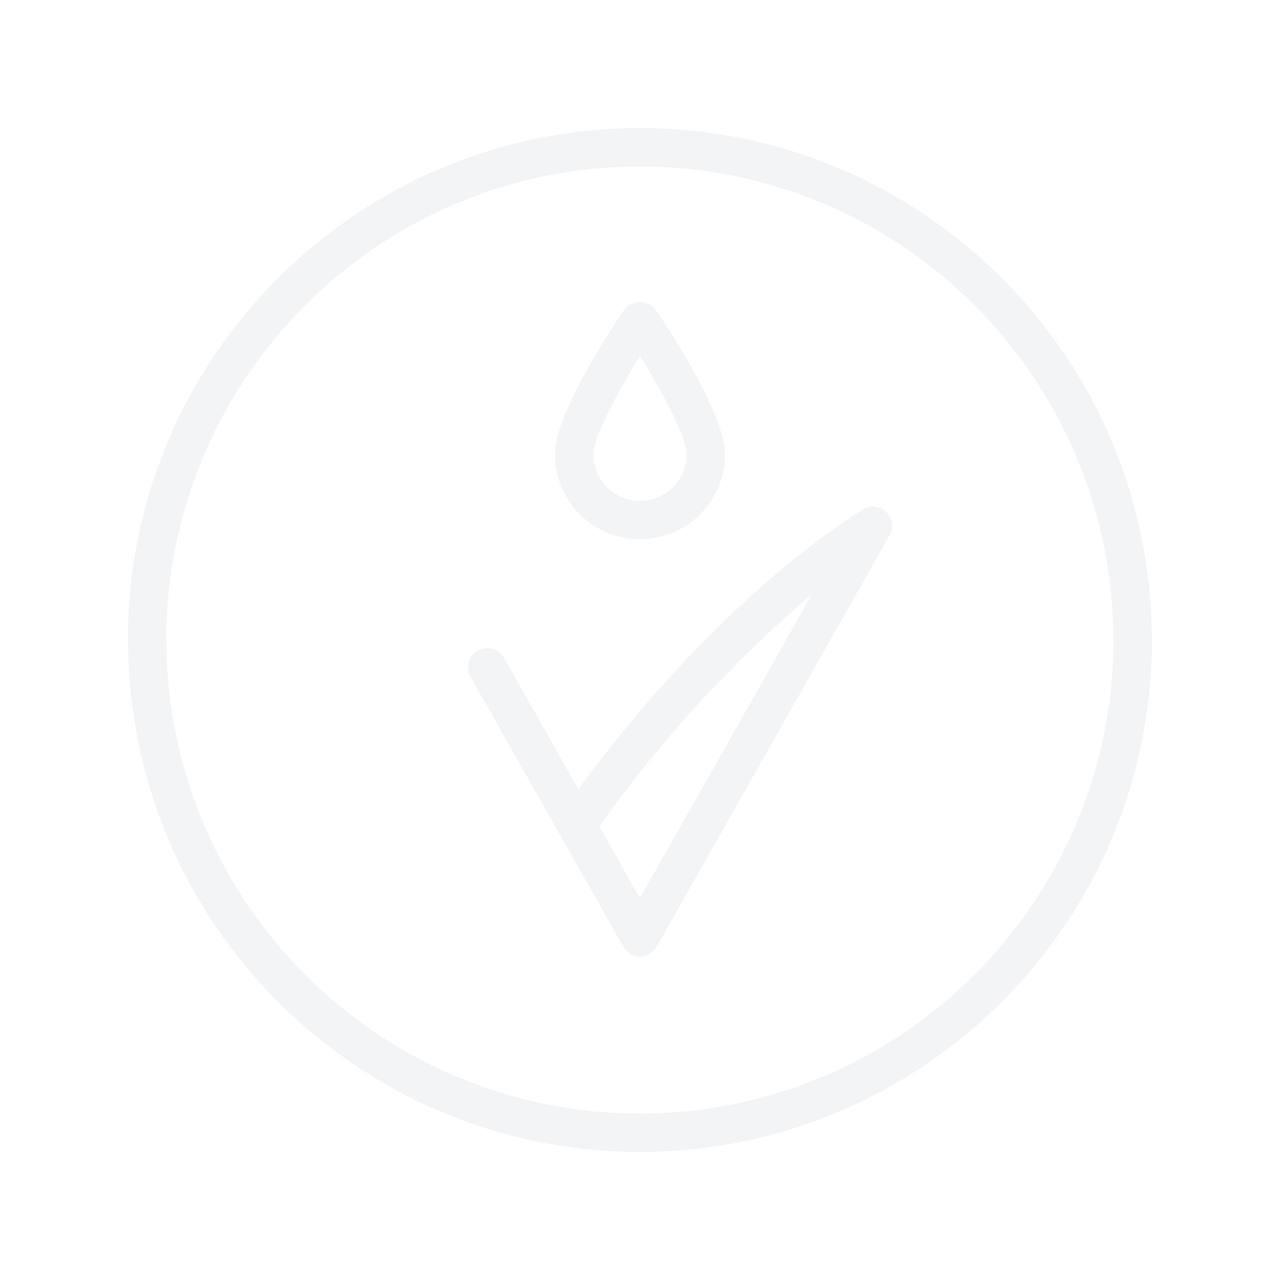 CUTRIN Muoto Silky Texture Sugar Spray 200ml